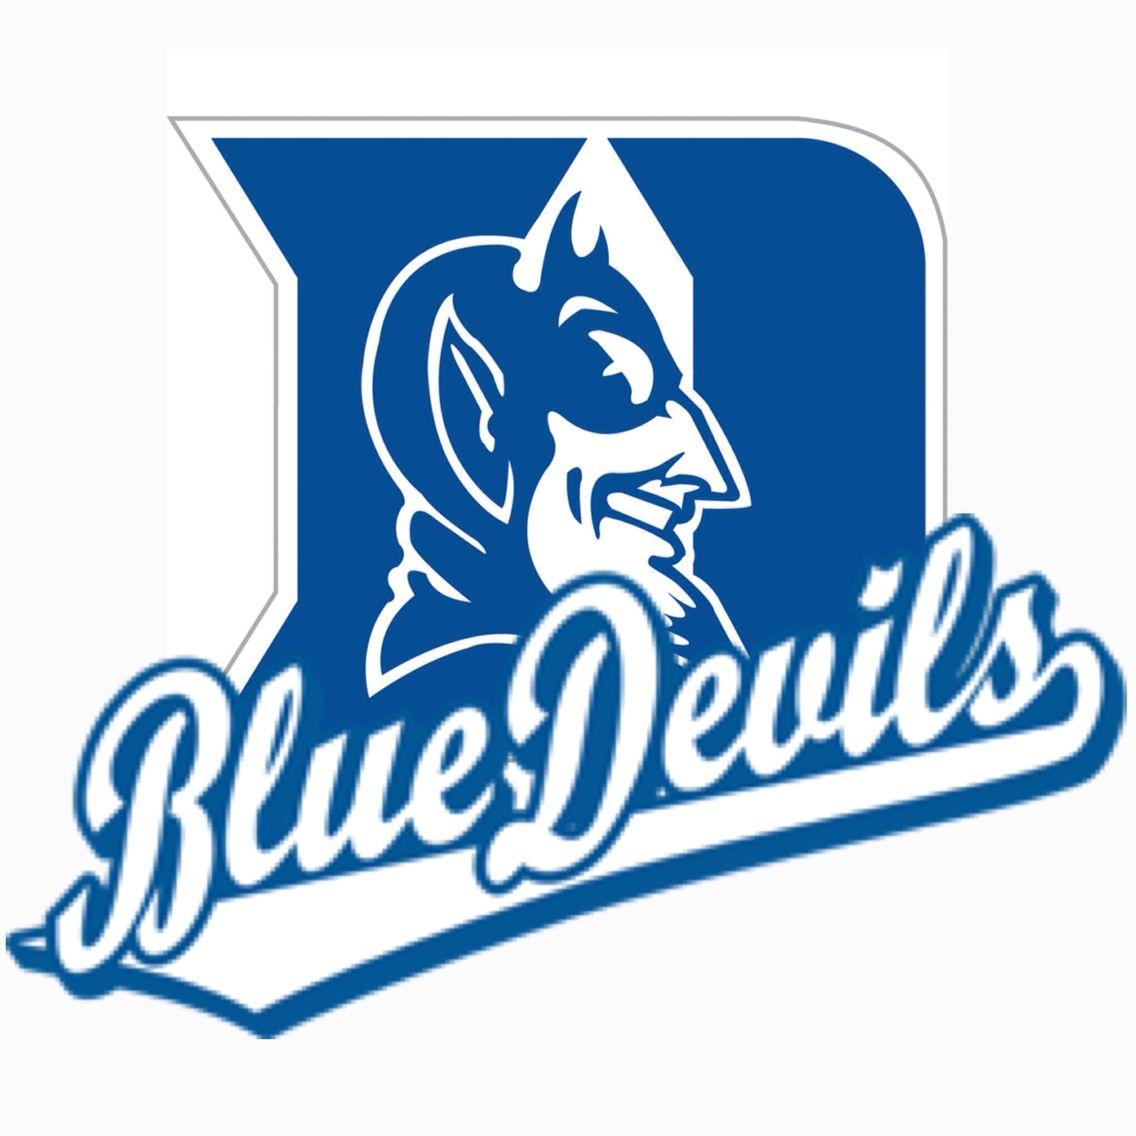 duke basketball logo committed - photo #23